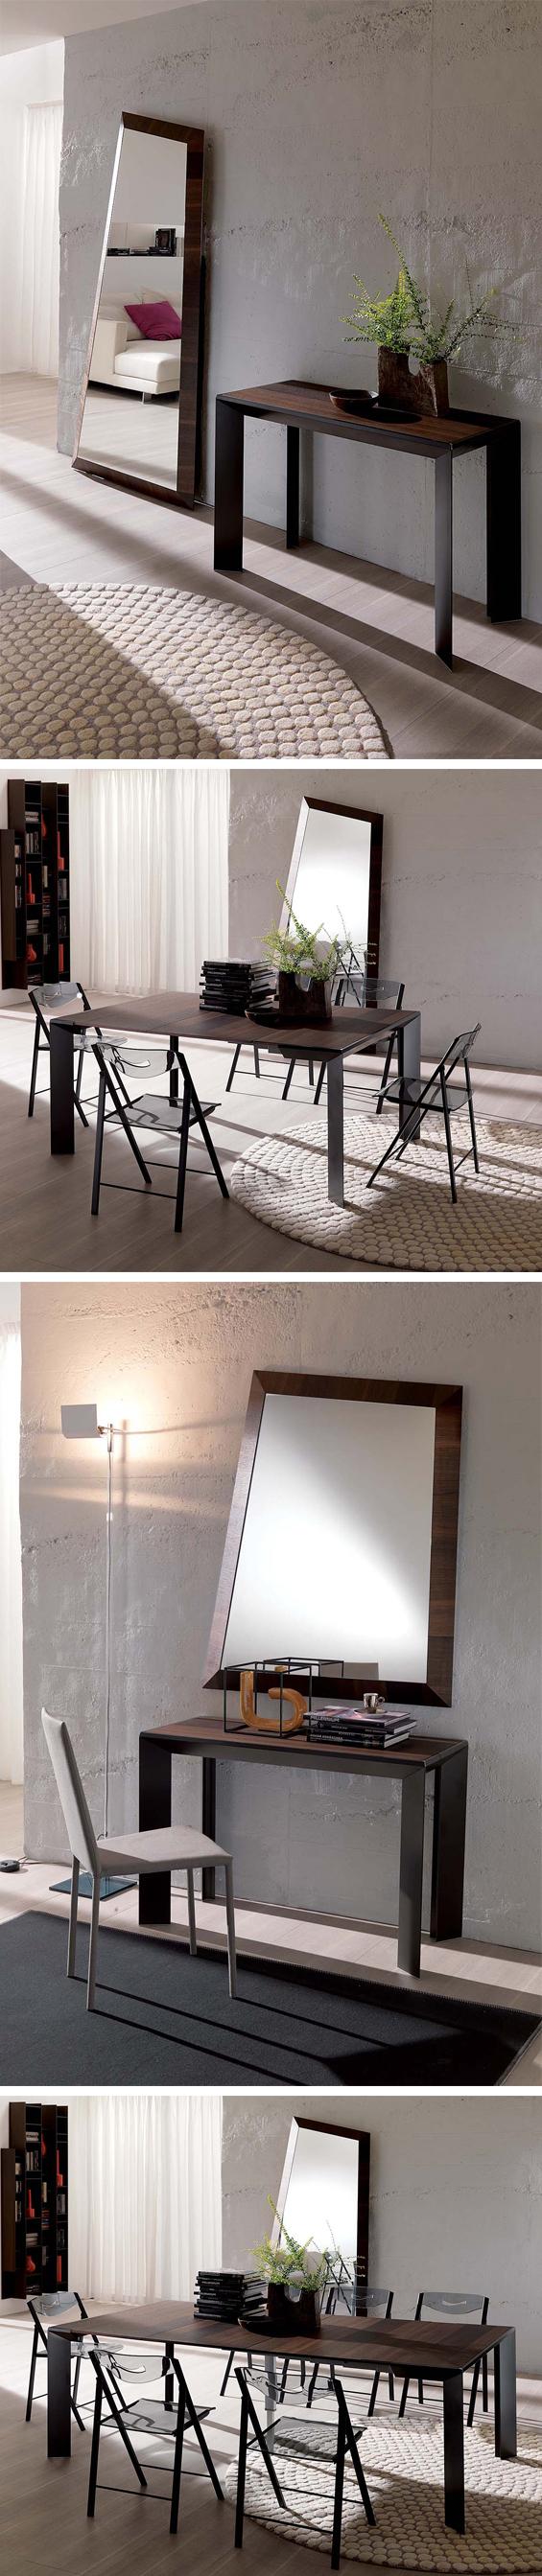 ozzio konsole metro xelle tische. Black Bedroom Furniture Sets. Home Design Ideas